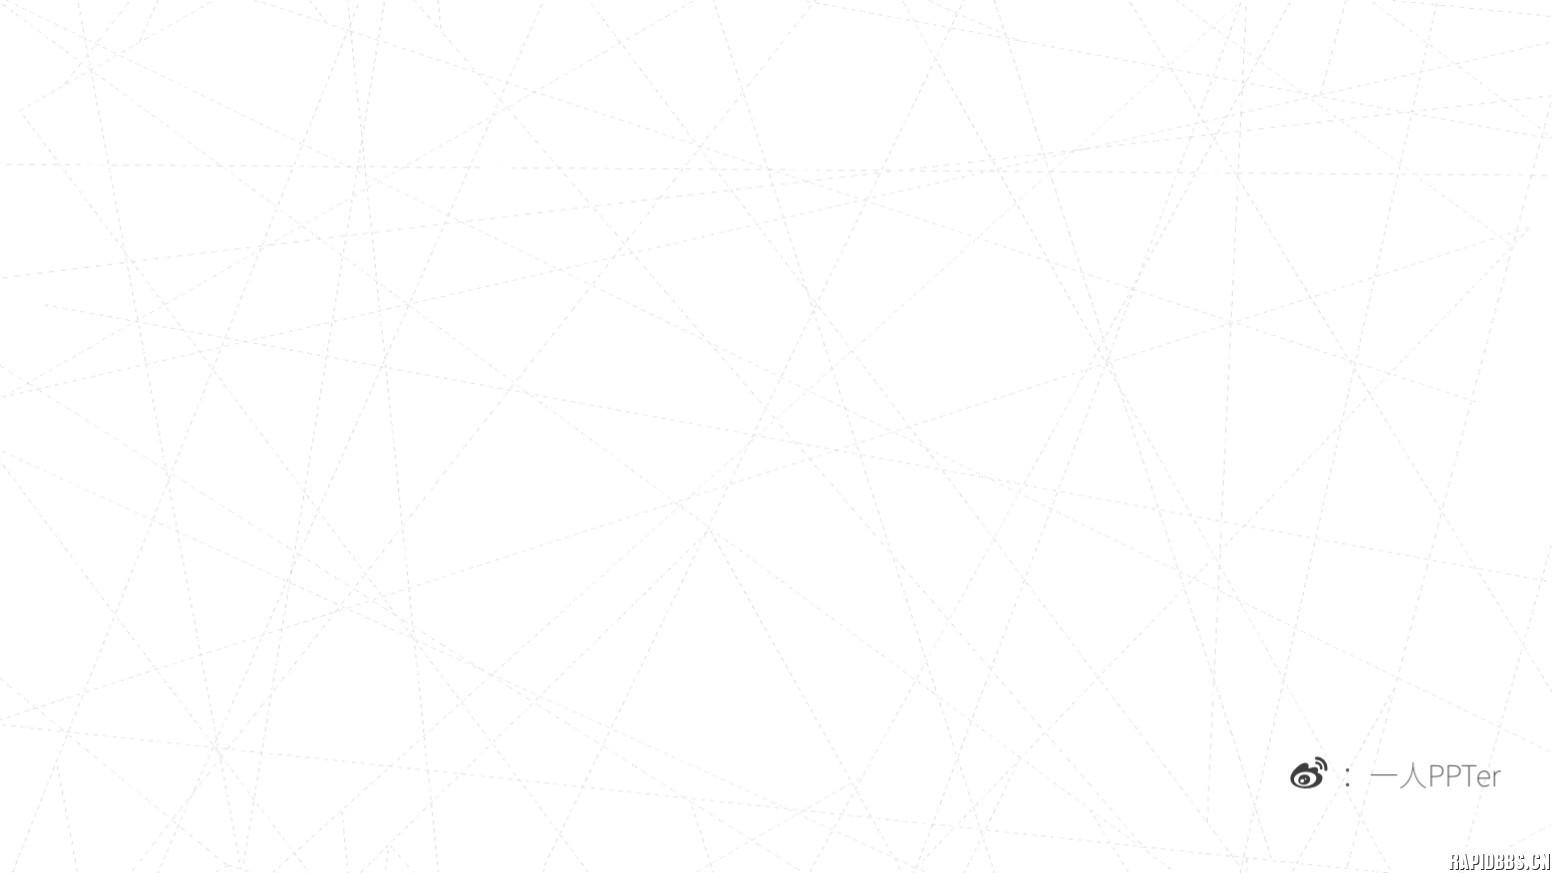 PPT素材分享之八种实用浅色背景【网格、纸纹、低平面、线条、皮质、斜线】 - PPT模板 - 锐普PPT论坛 - Powered by Discuz!